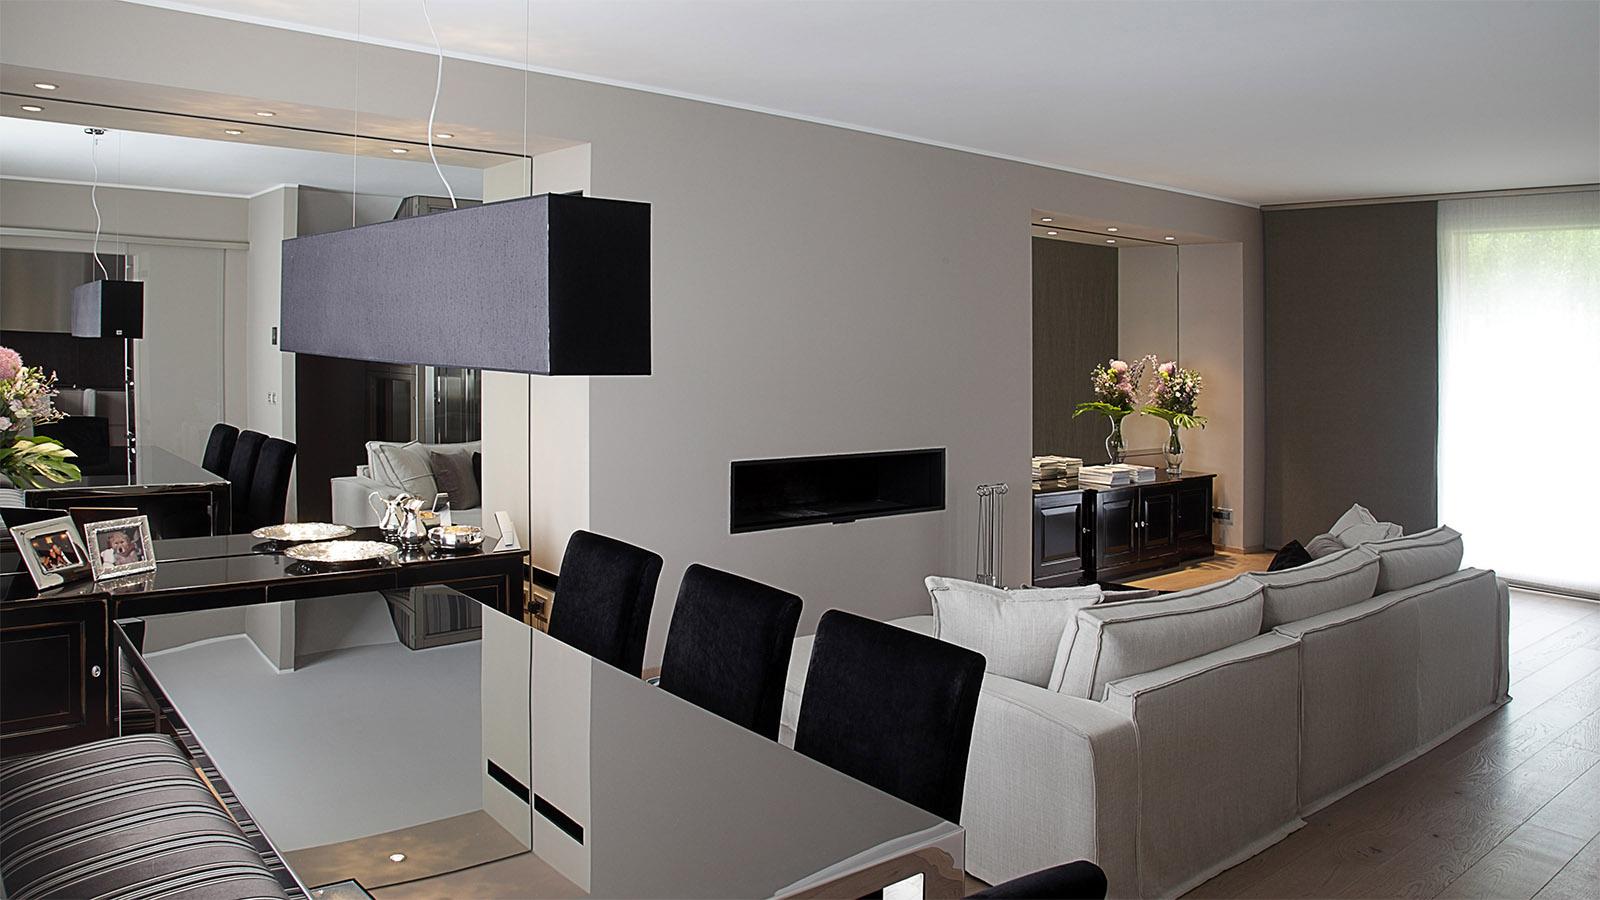 paolafavretto-interiordesigner-lugano-home